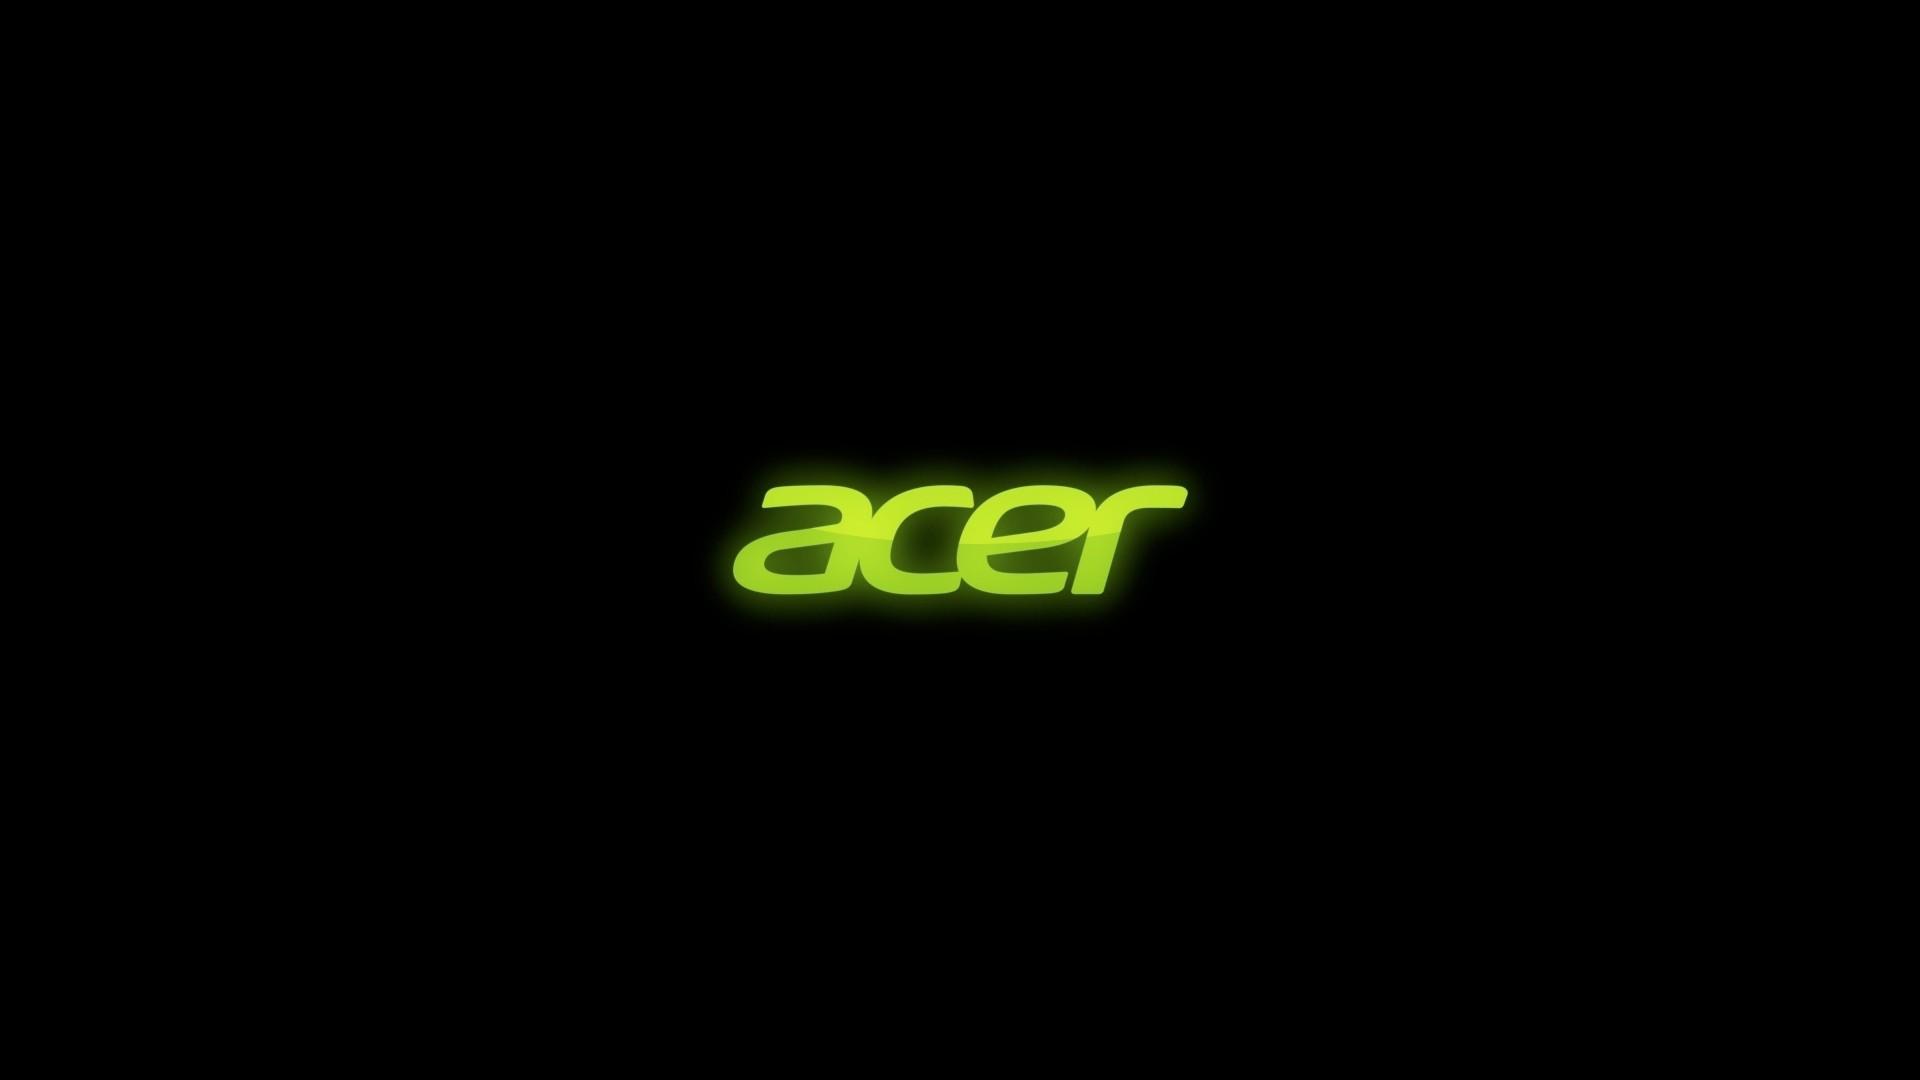 Download Wallpaper Acer, Firm, Green, Black Full HD 1080p HD .